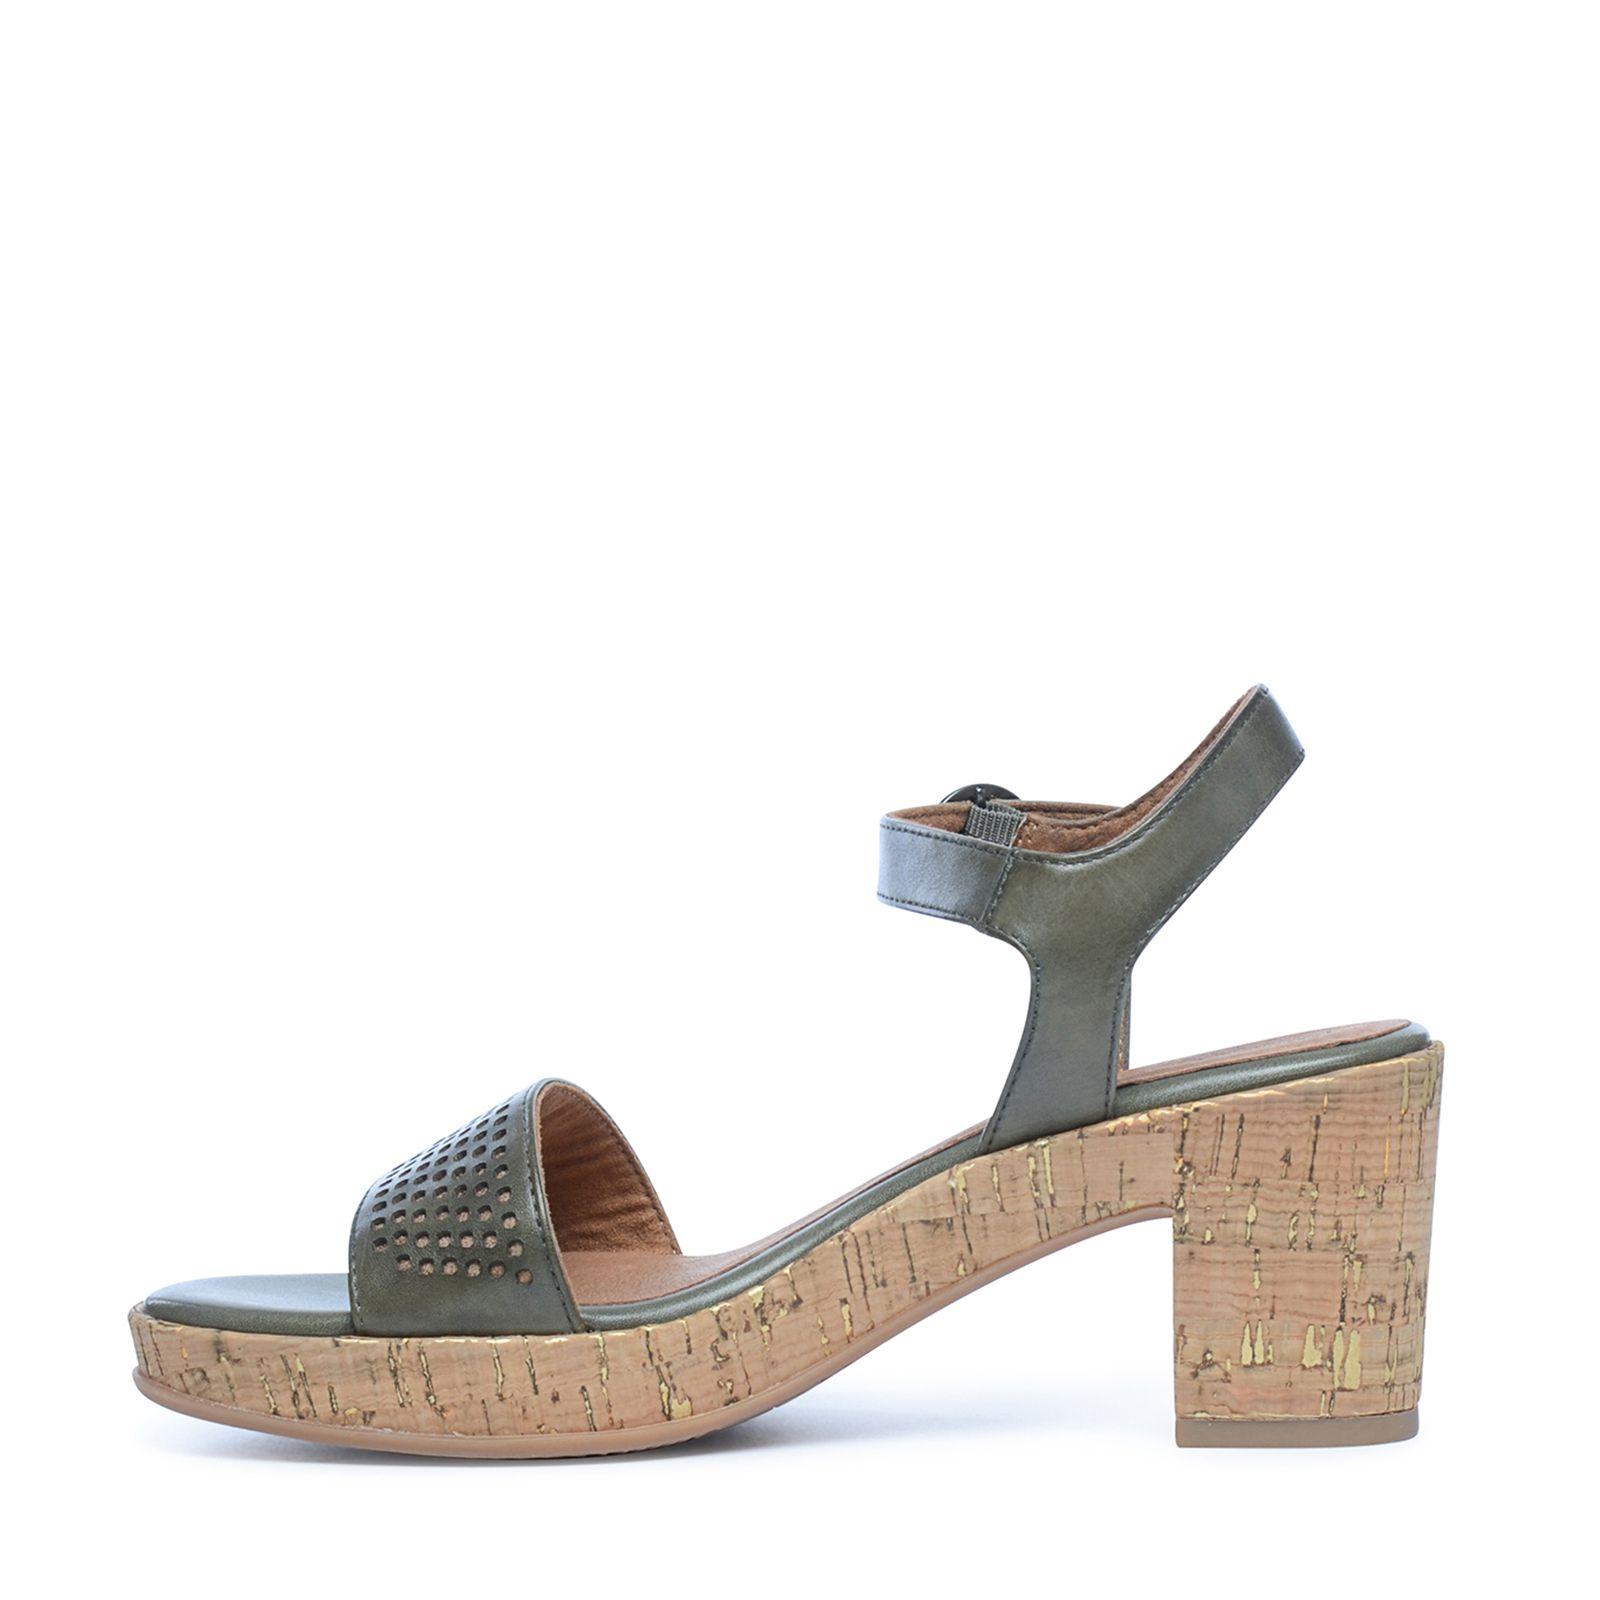 3f4188892 Groene sandalen met hak en motief - Dames   MANFIELD